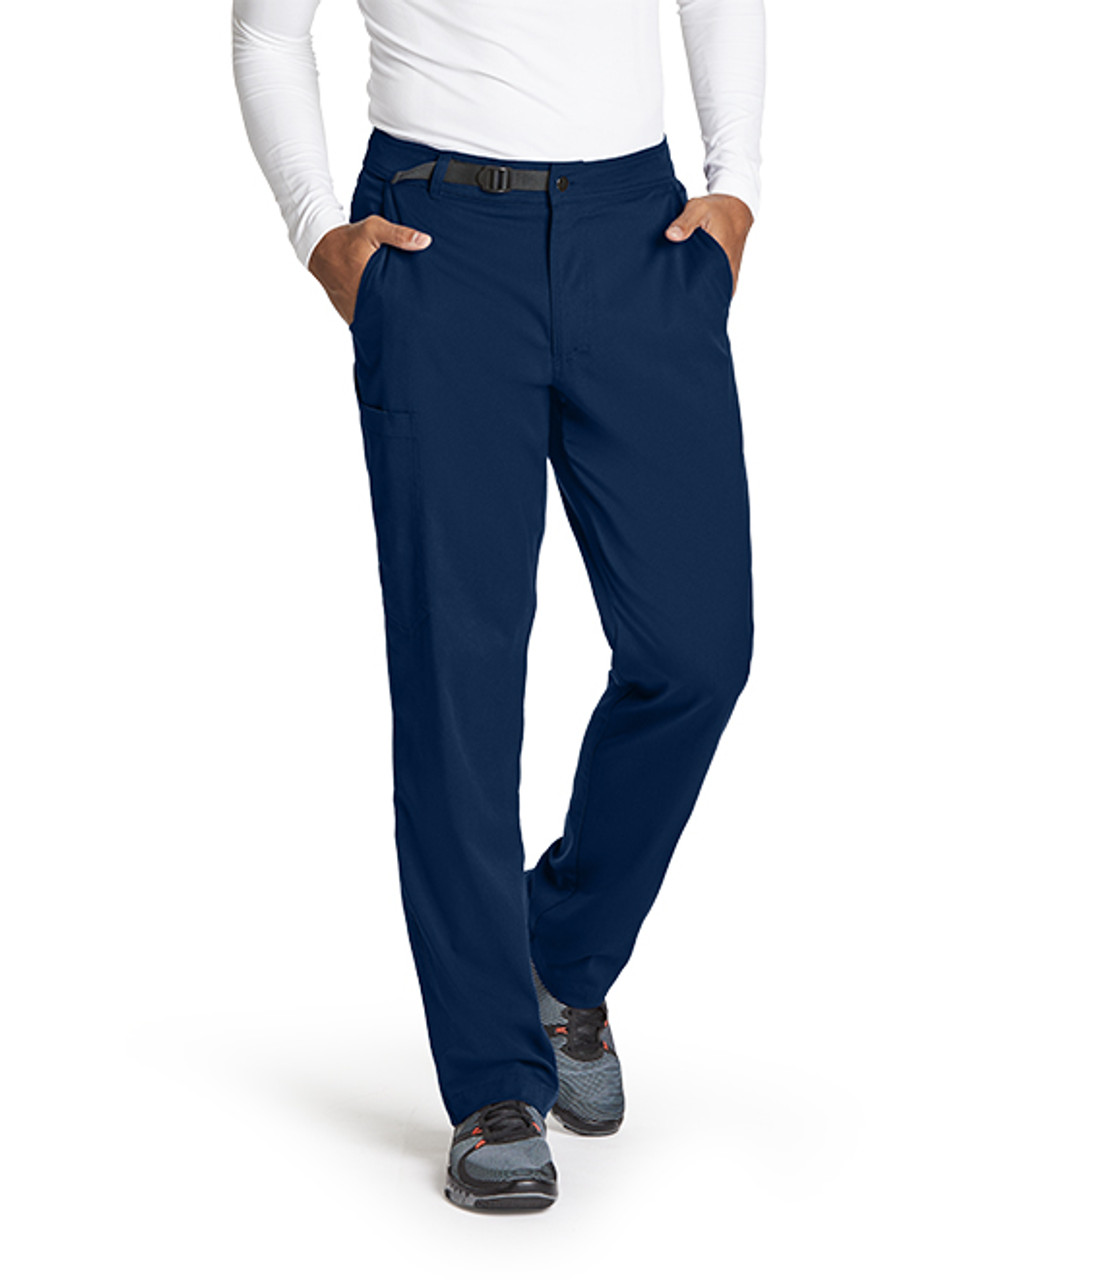 1291941bf01 (GRSP507) Grey's Anatomy Active Stretch Men's 4 Pocket Belted Waist Cargo  Pant ...